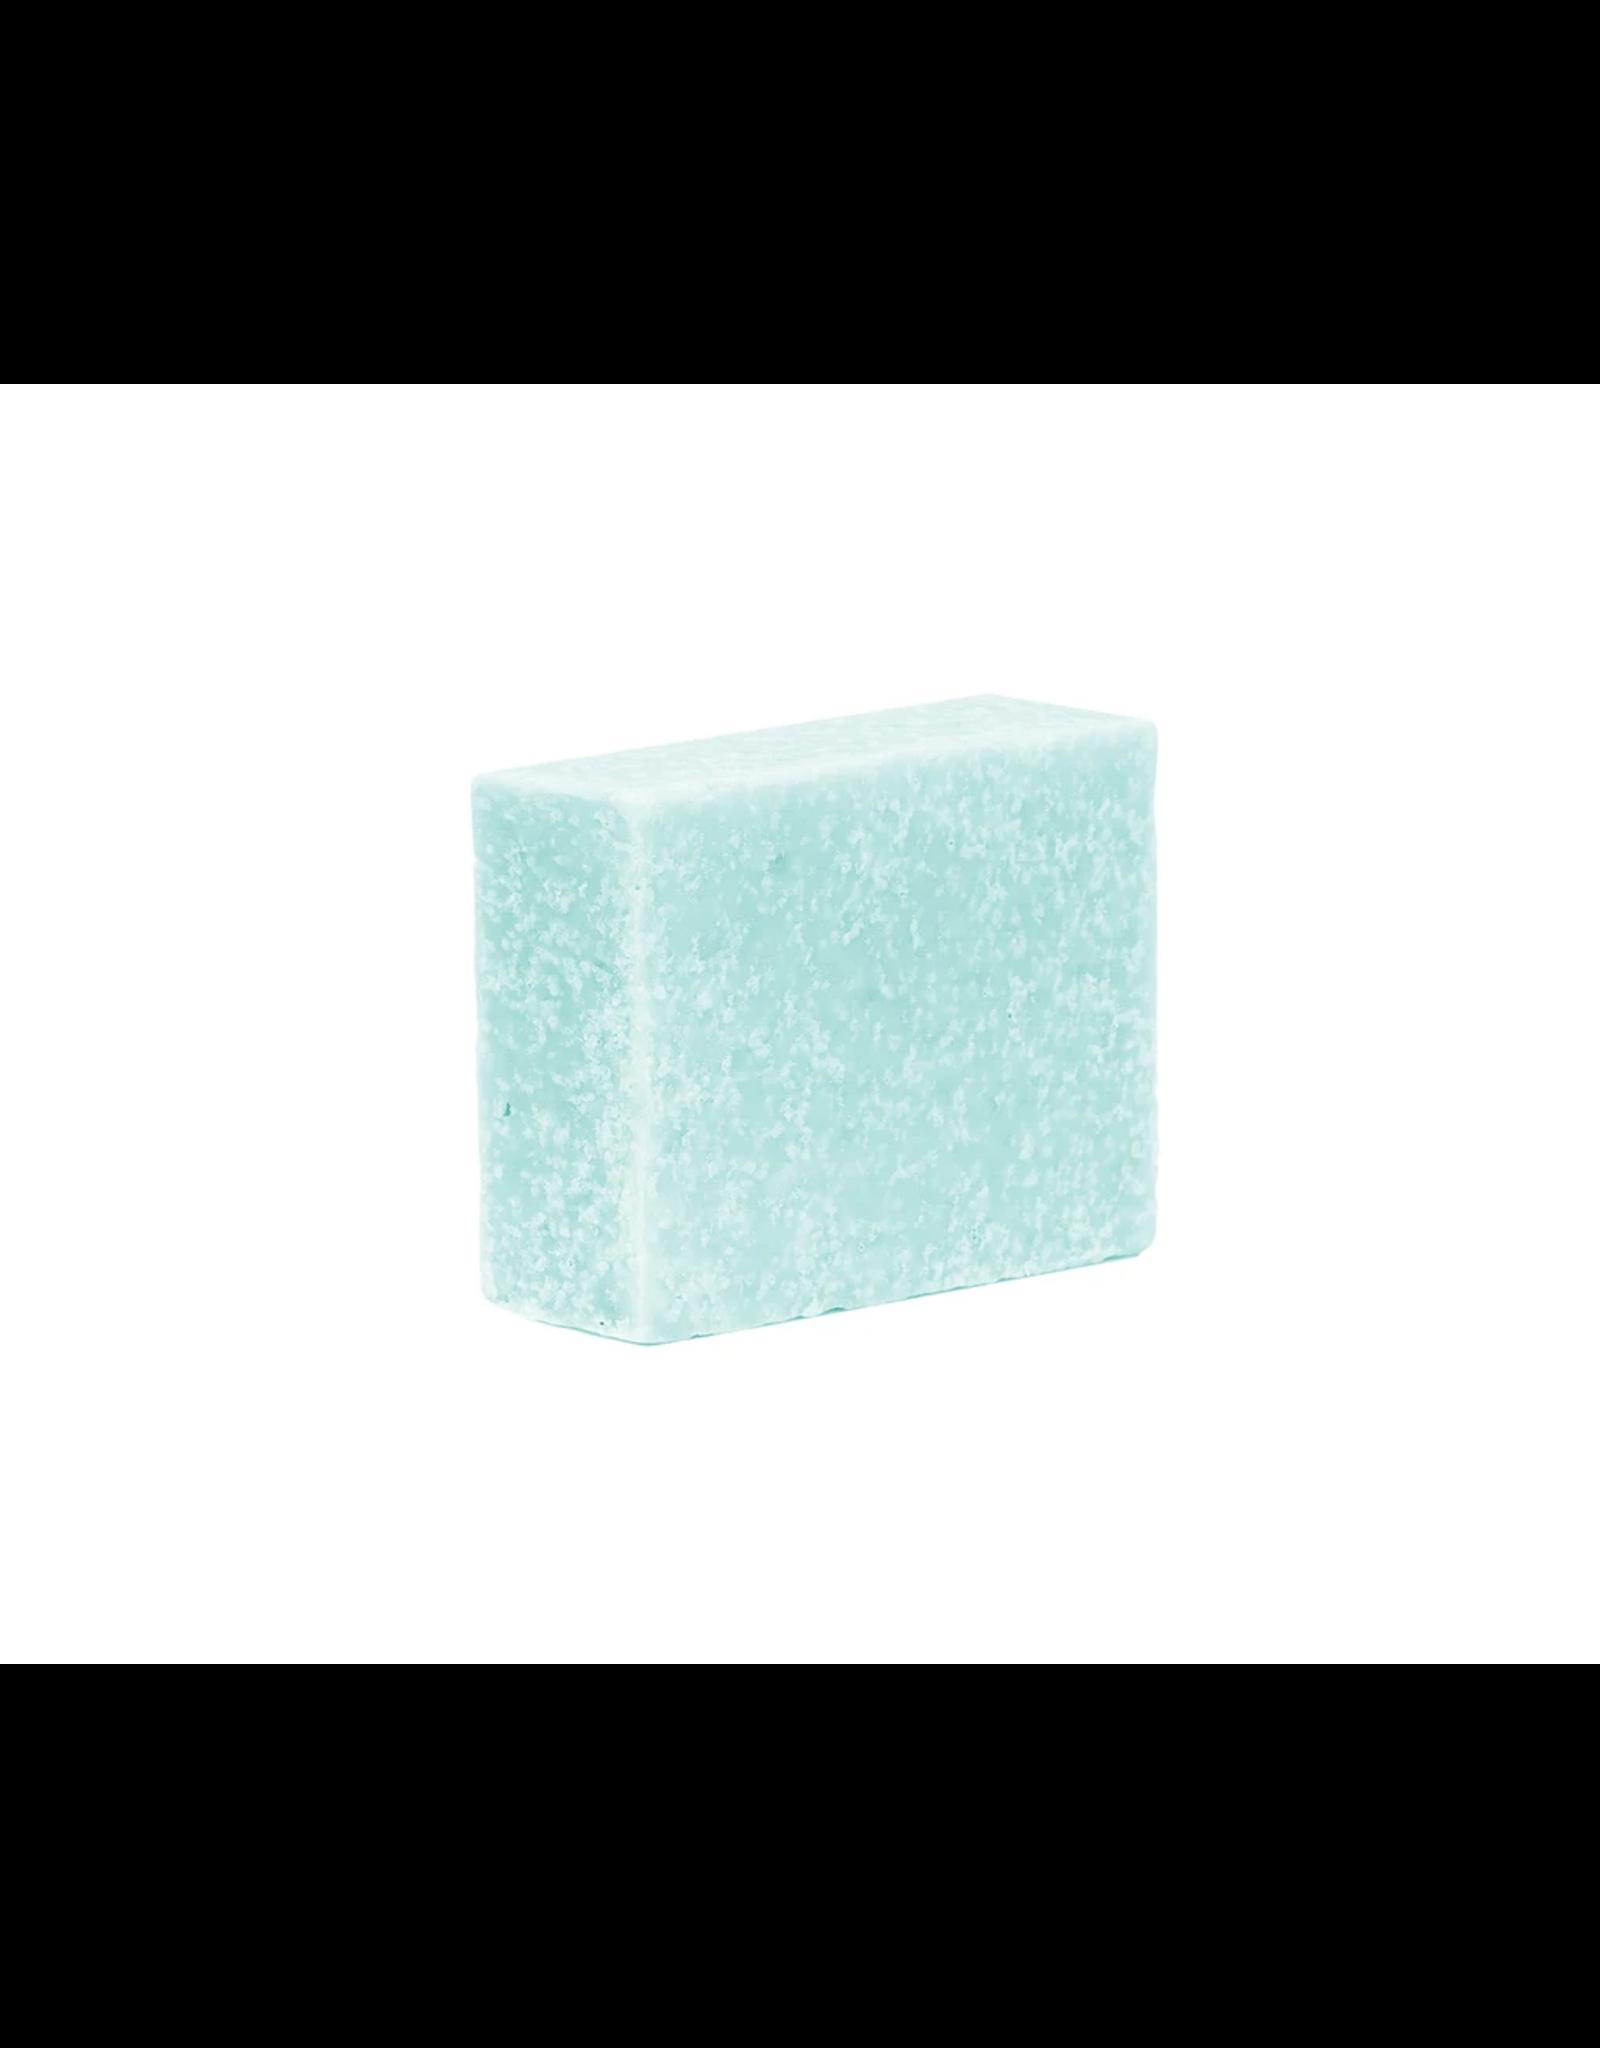 Unwrapped Life Bubble-yum Body Bar